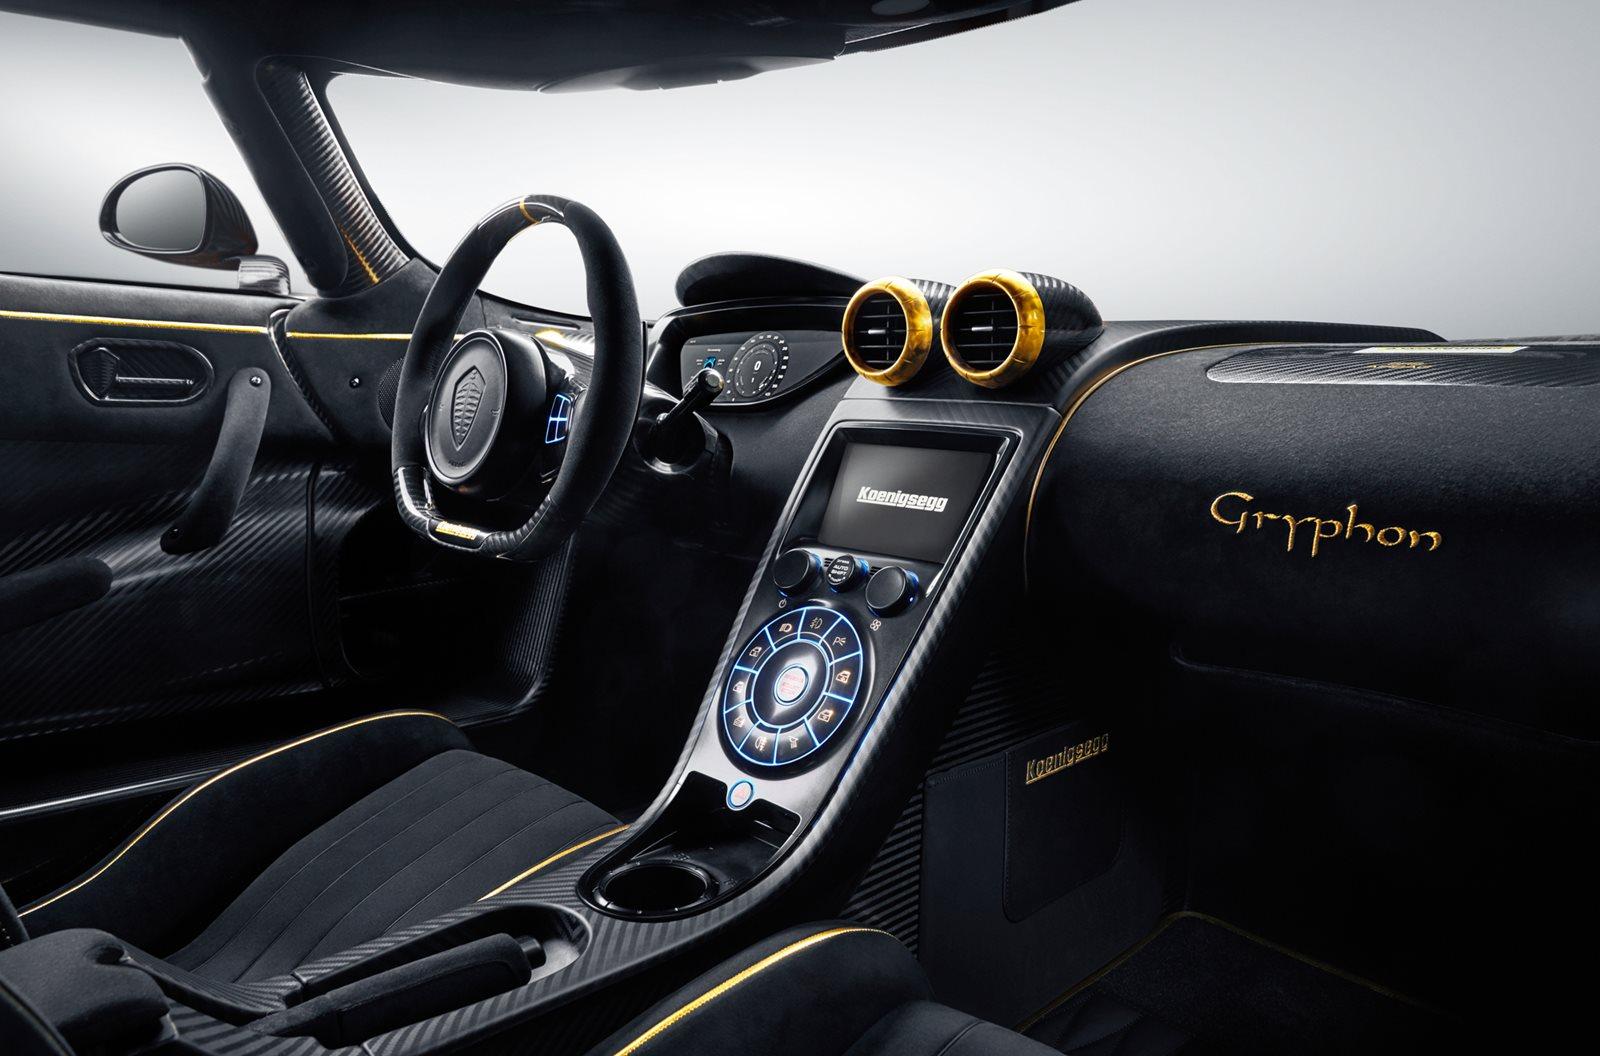 2015 Koenigsegg Agera RS Dashboard